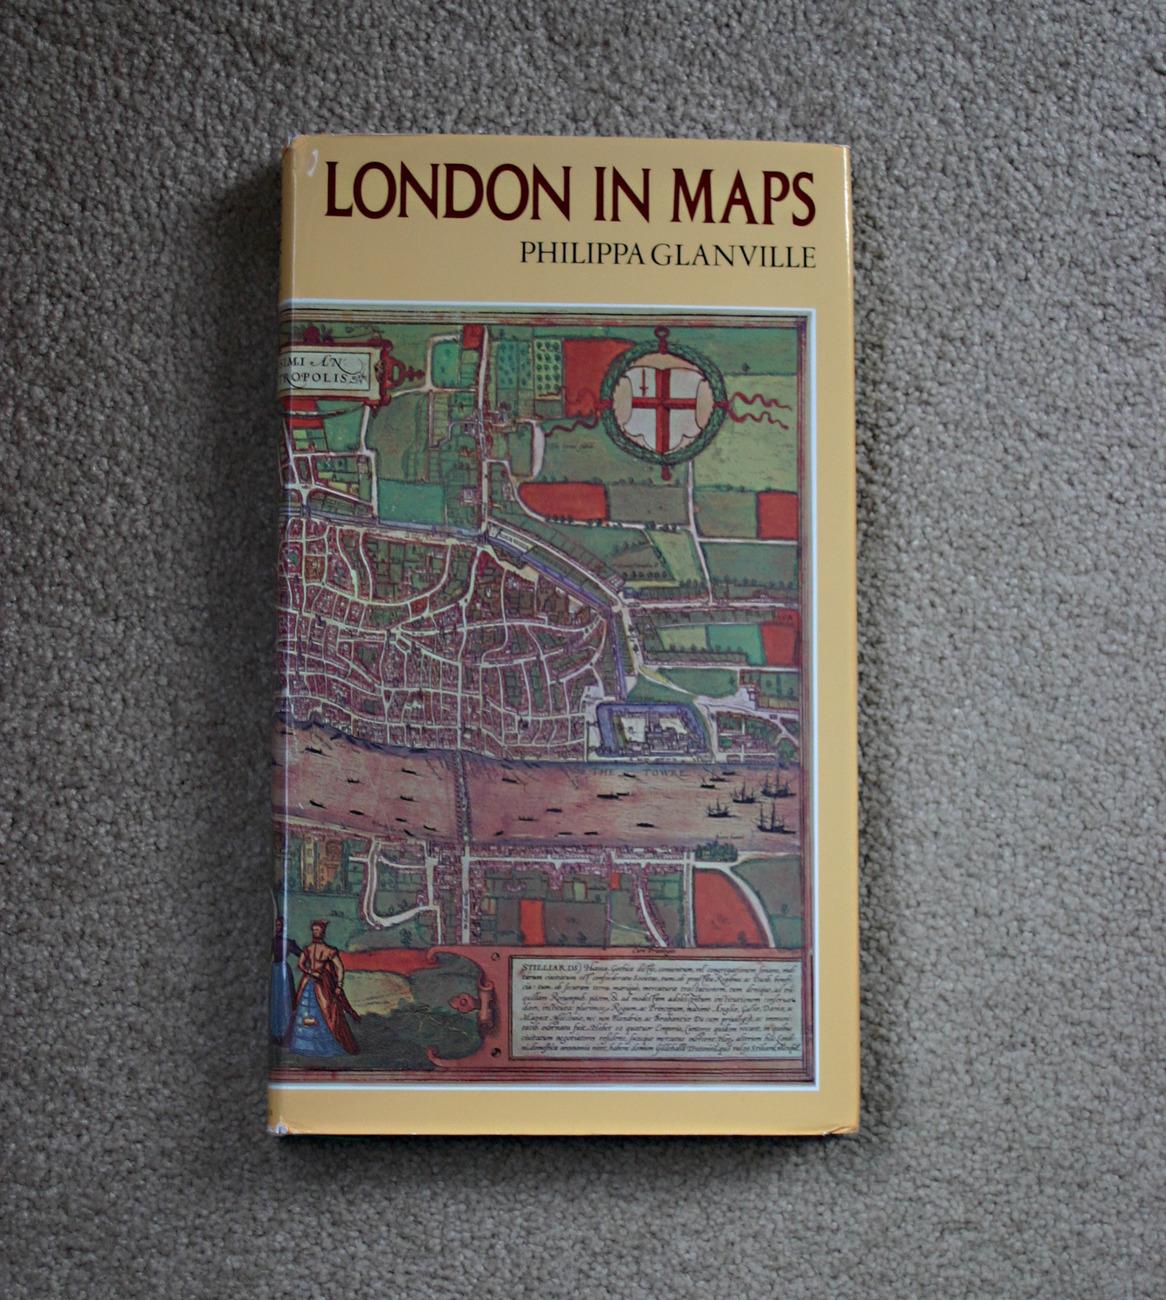 Londoninmapscover